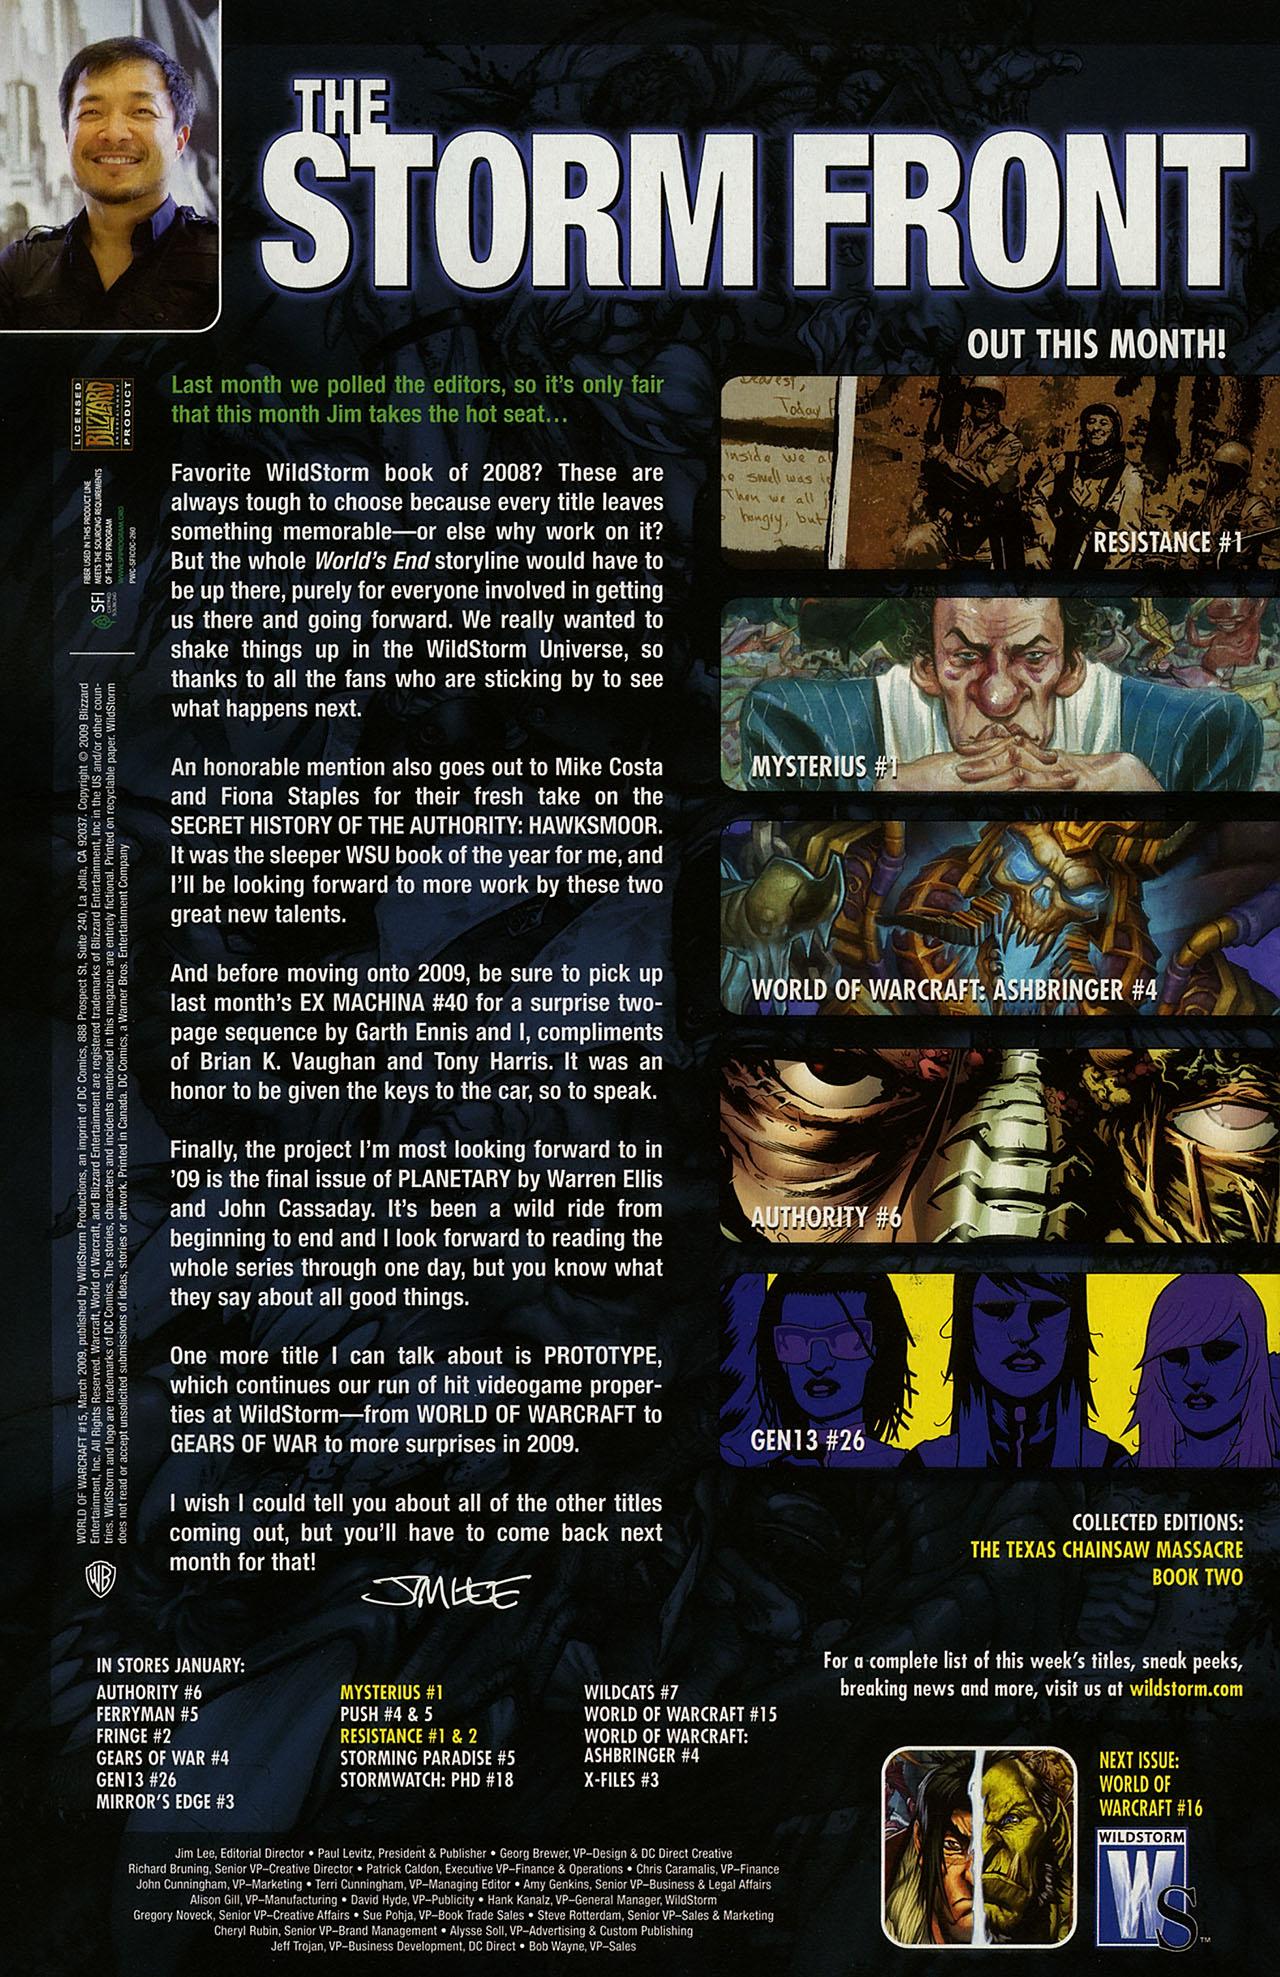 World of Warcraft 15 Page 22